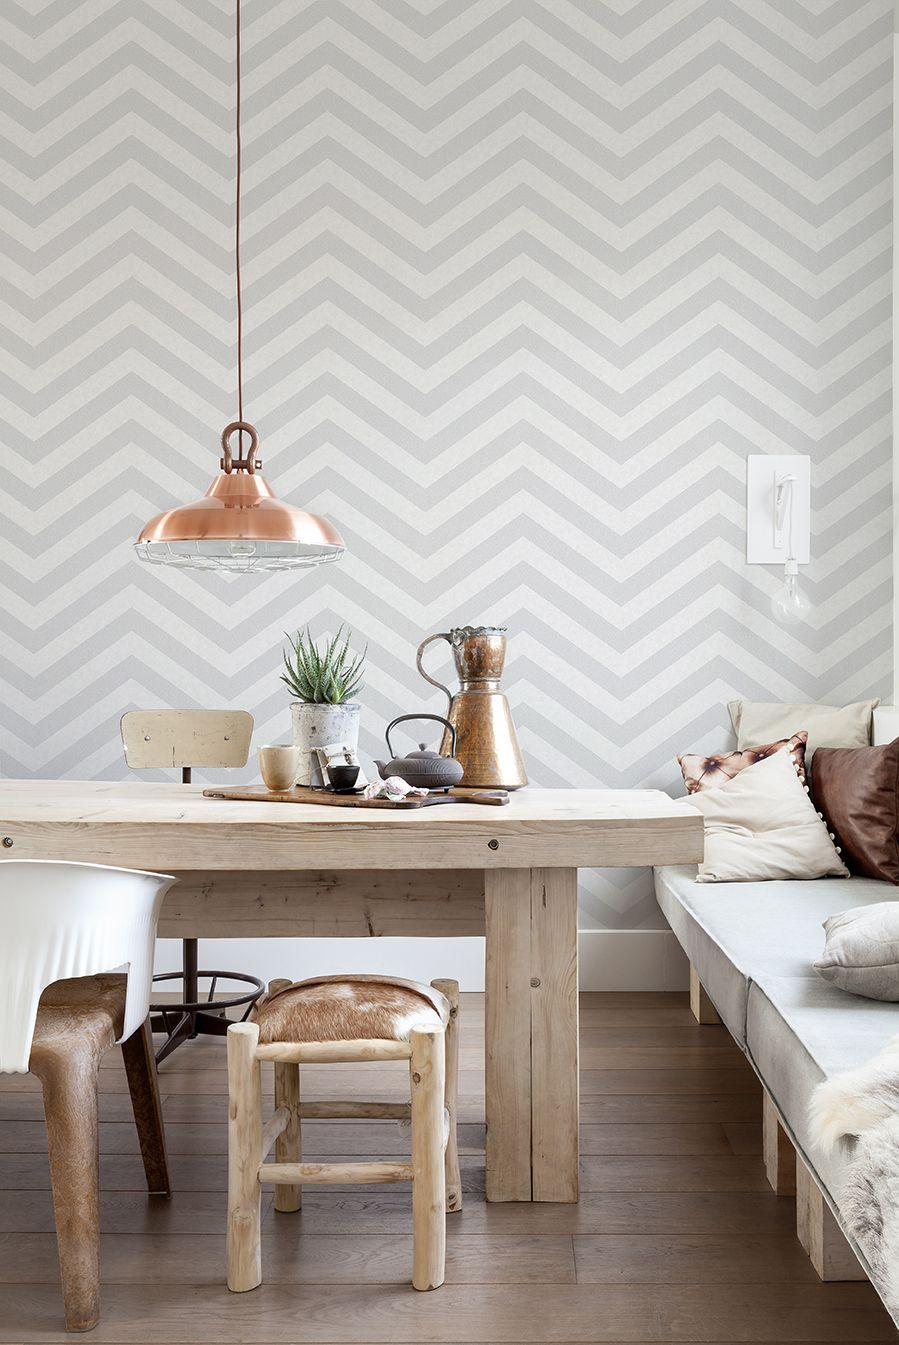 Black and White Chevron Stripe Wallpaper | Mod 6 - 1 achomatic ...